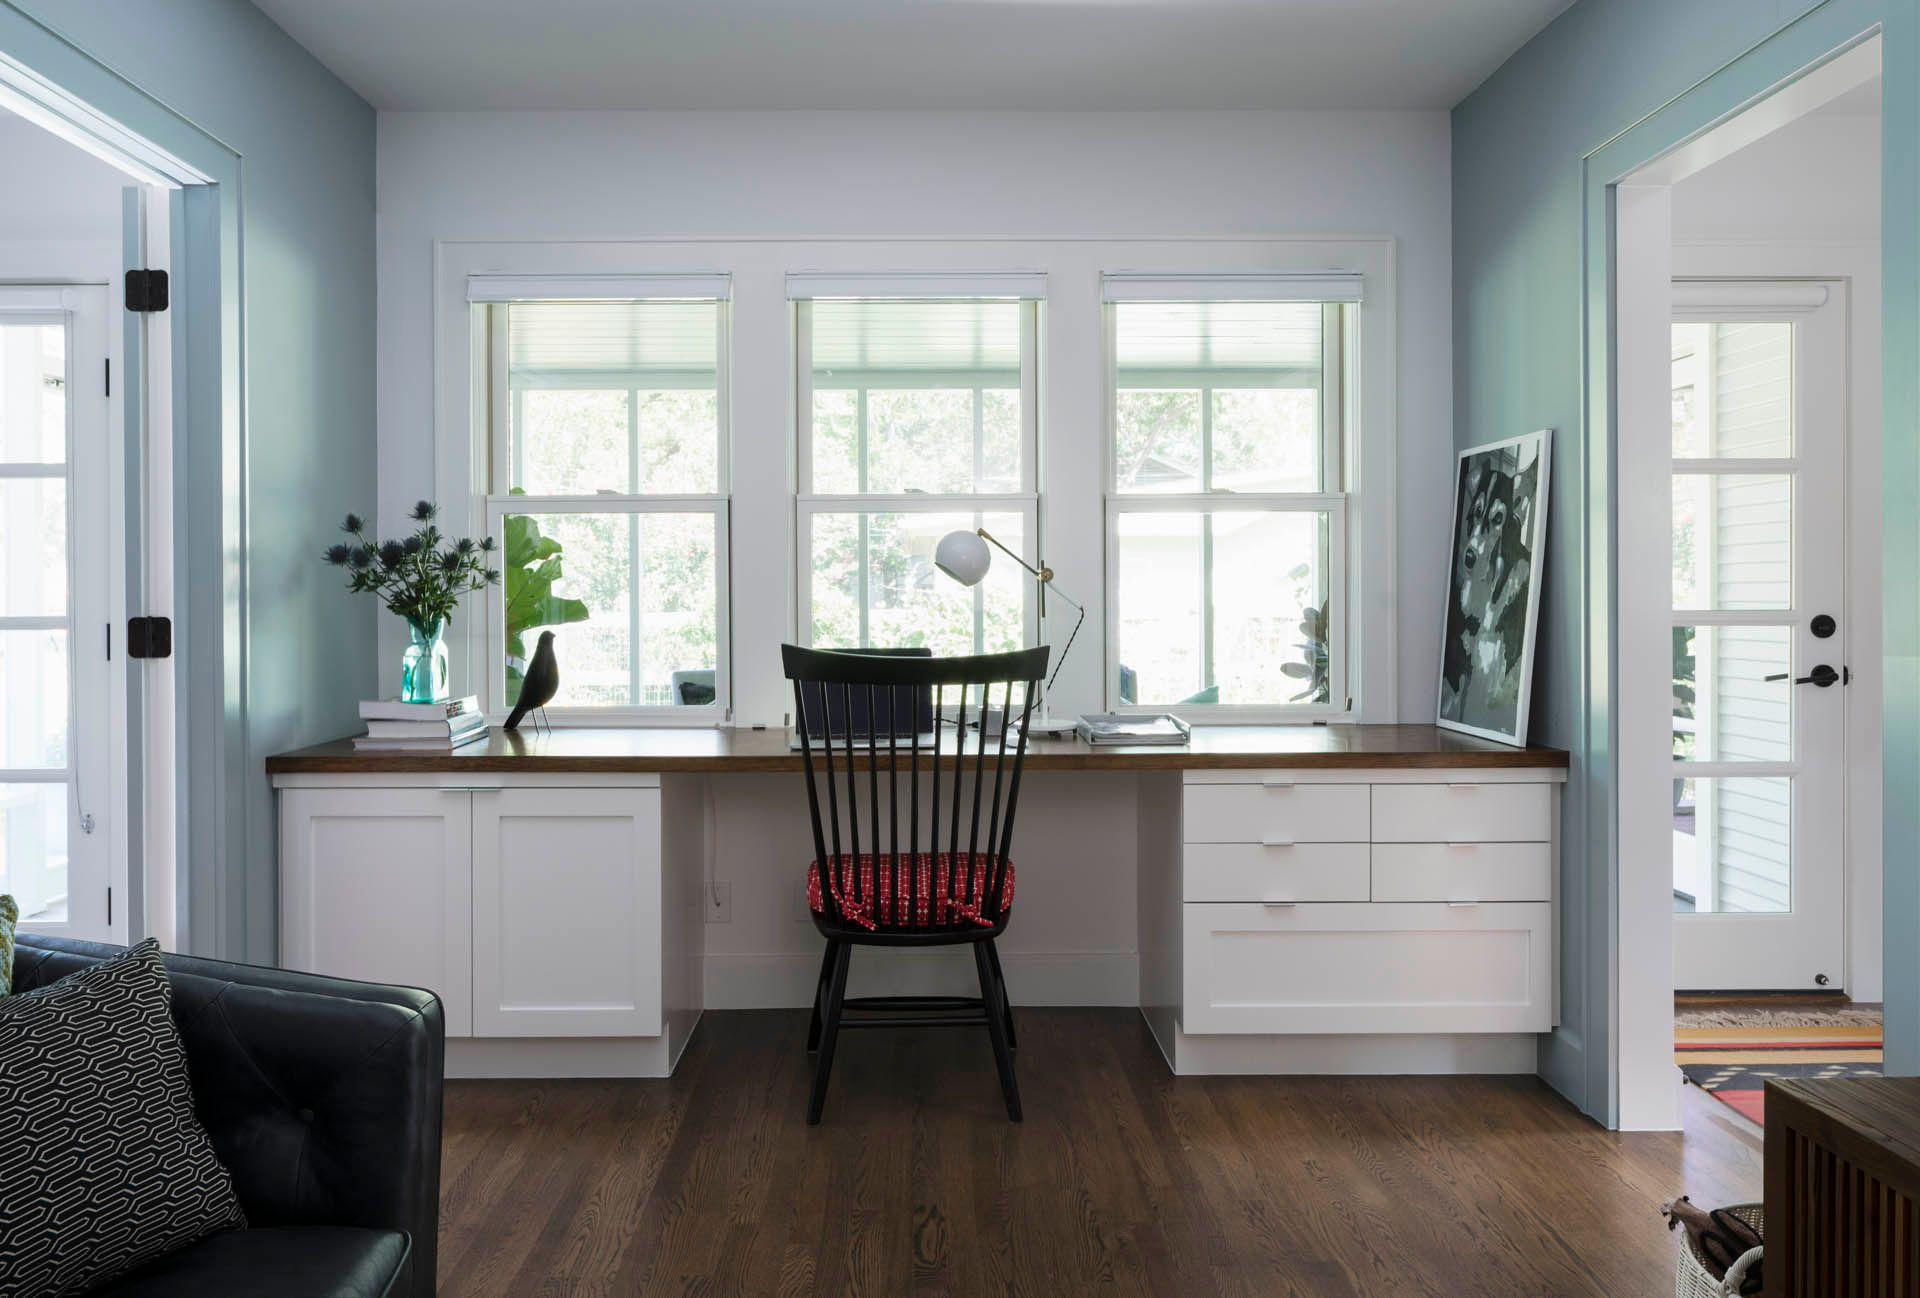 Bright Modern Interior Decor in Austin, Texas